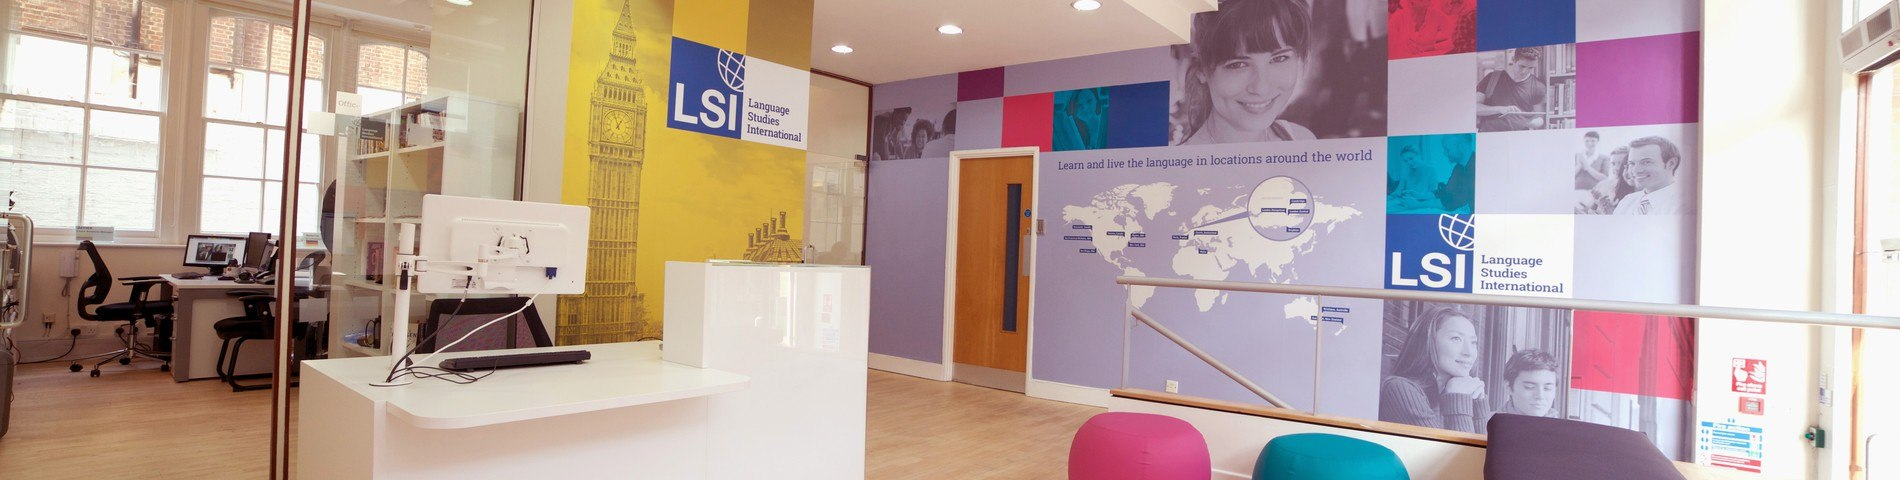 LSI - Language Studies International - Central obrazek 1